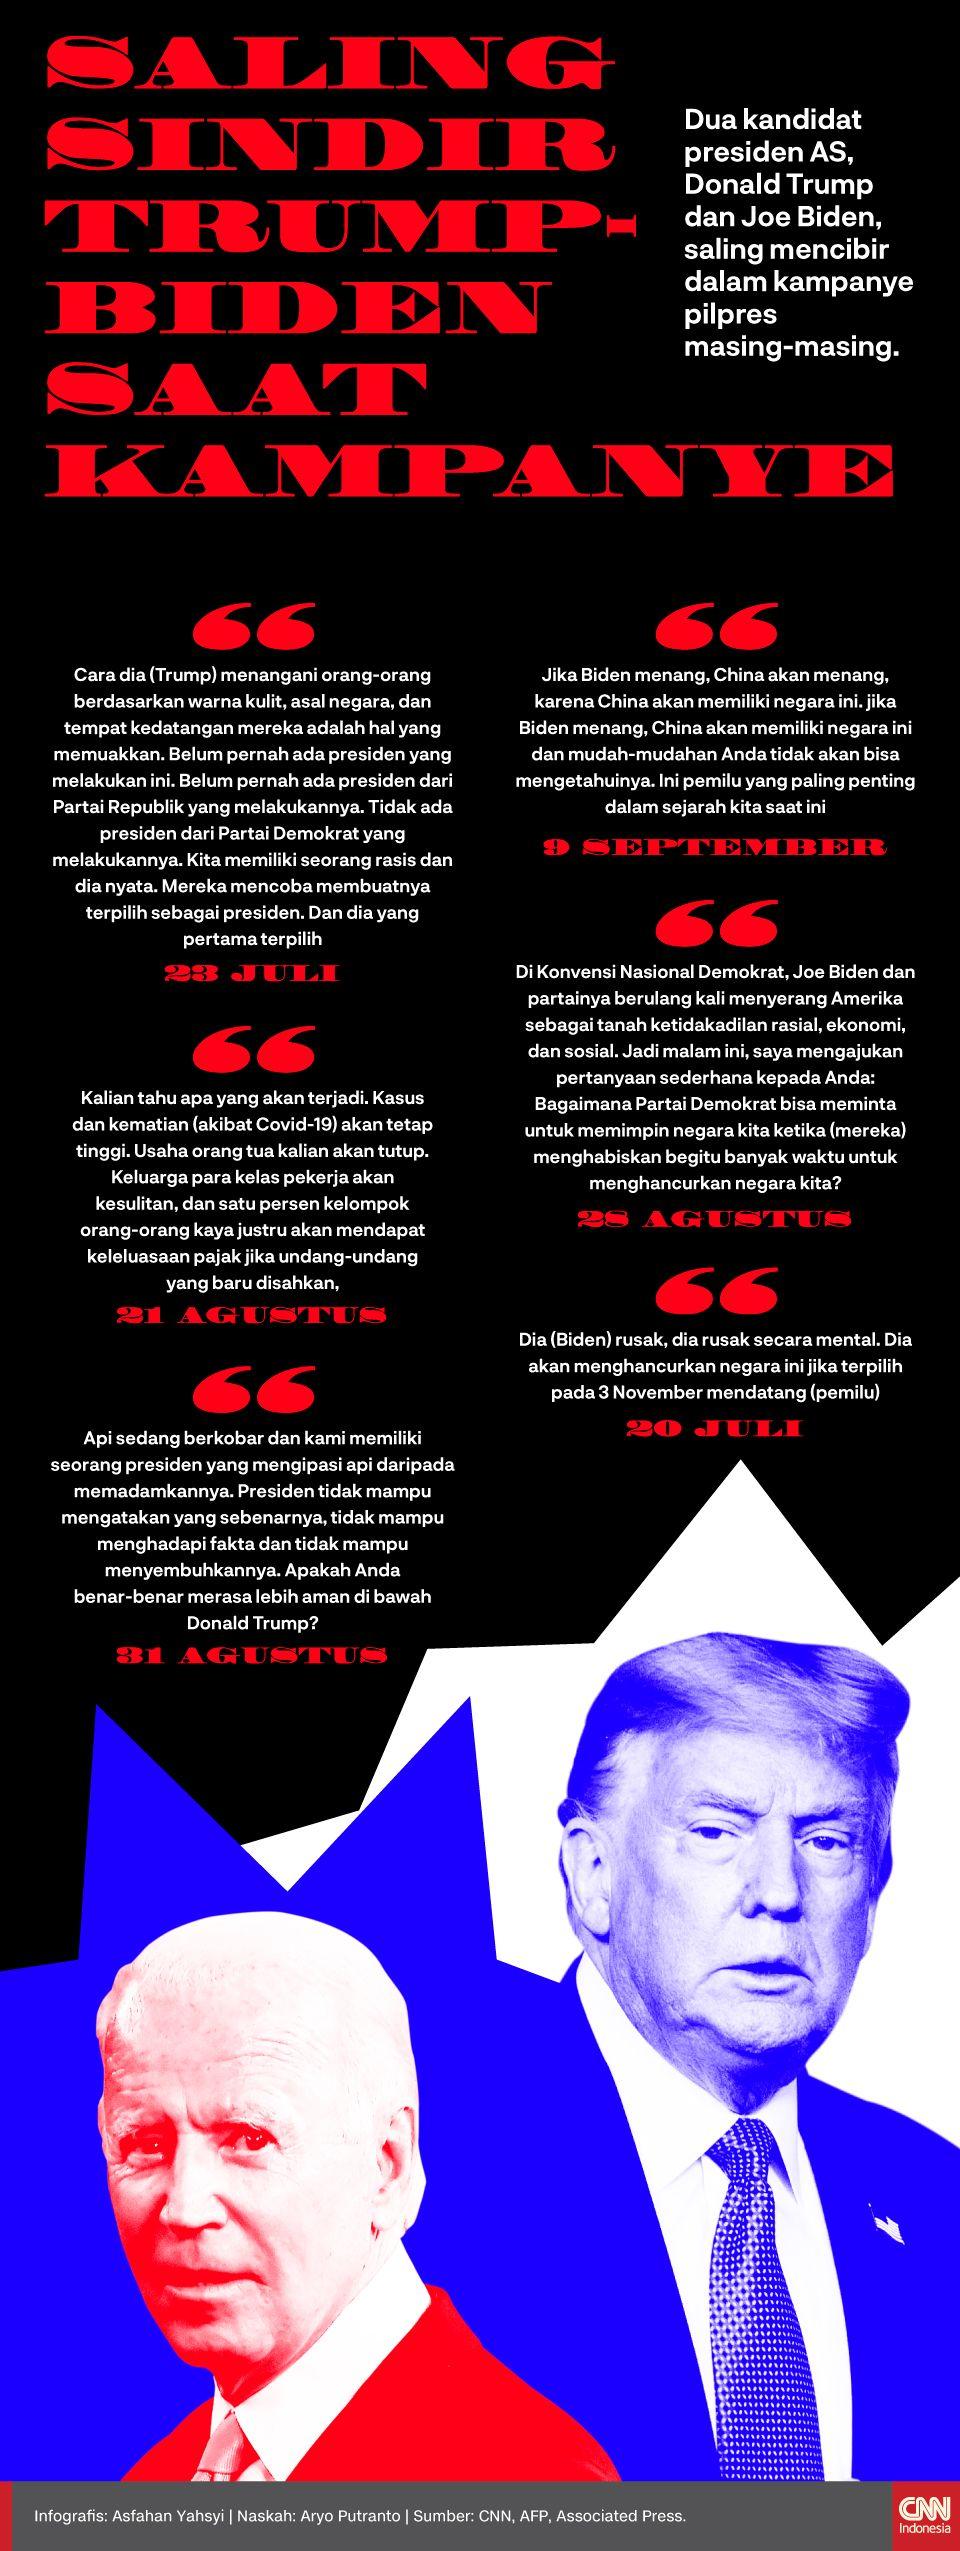 Pin Di Infografis Cnn Indonesia